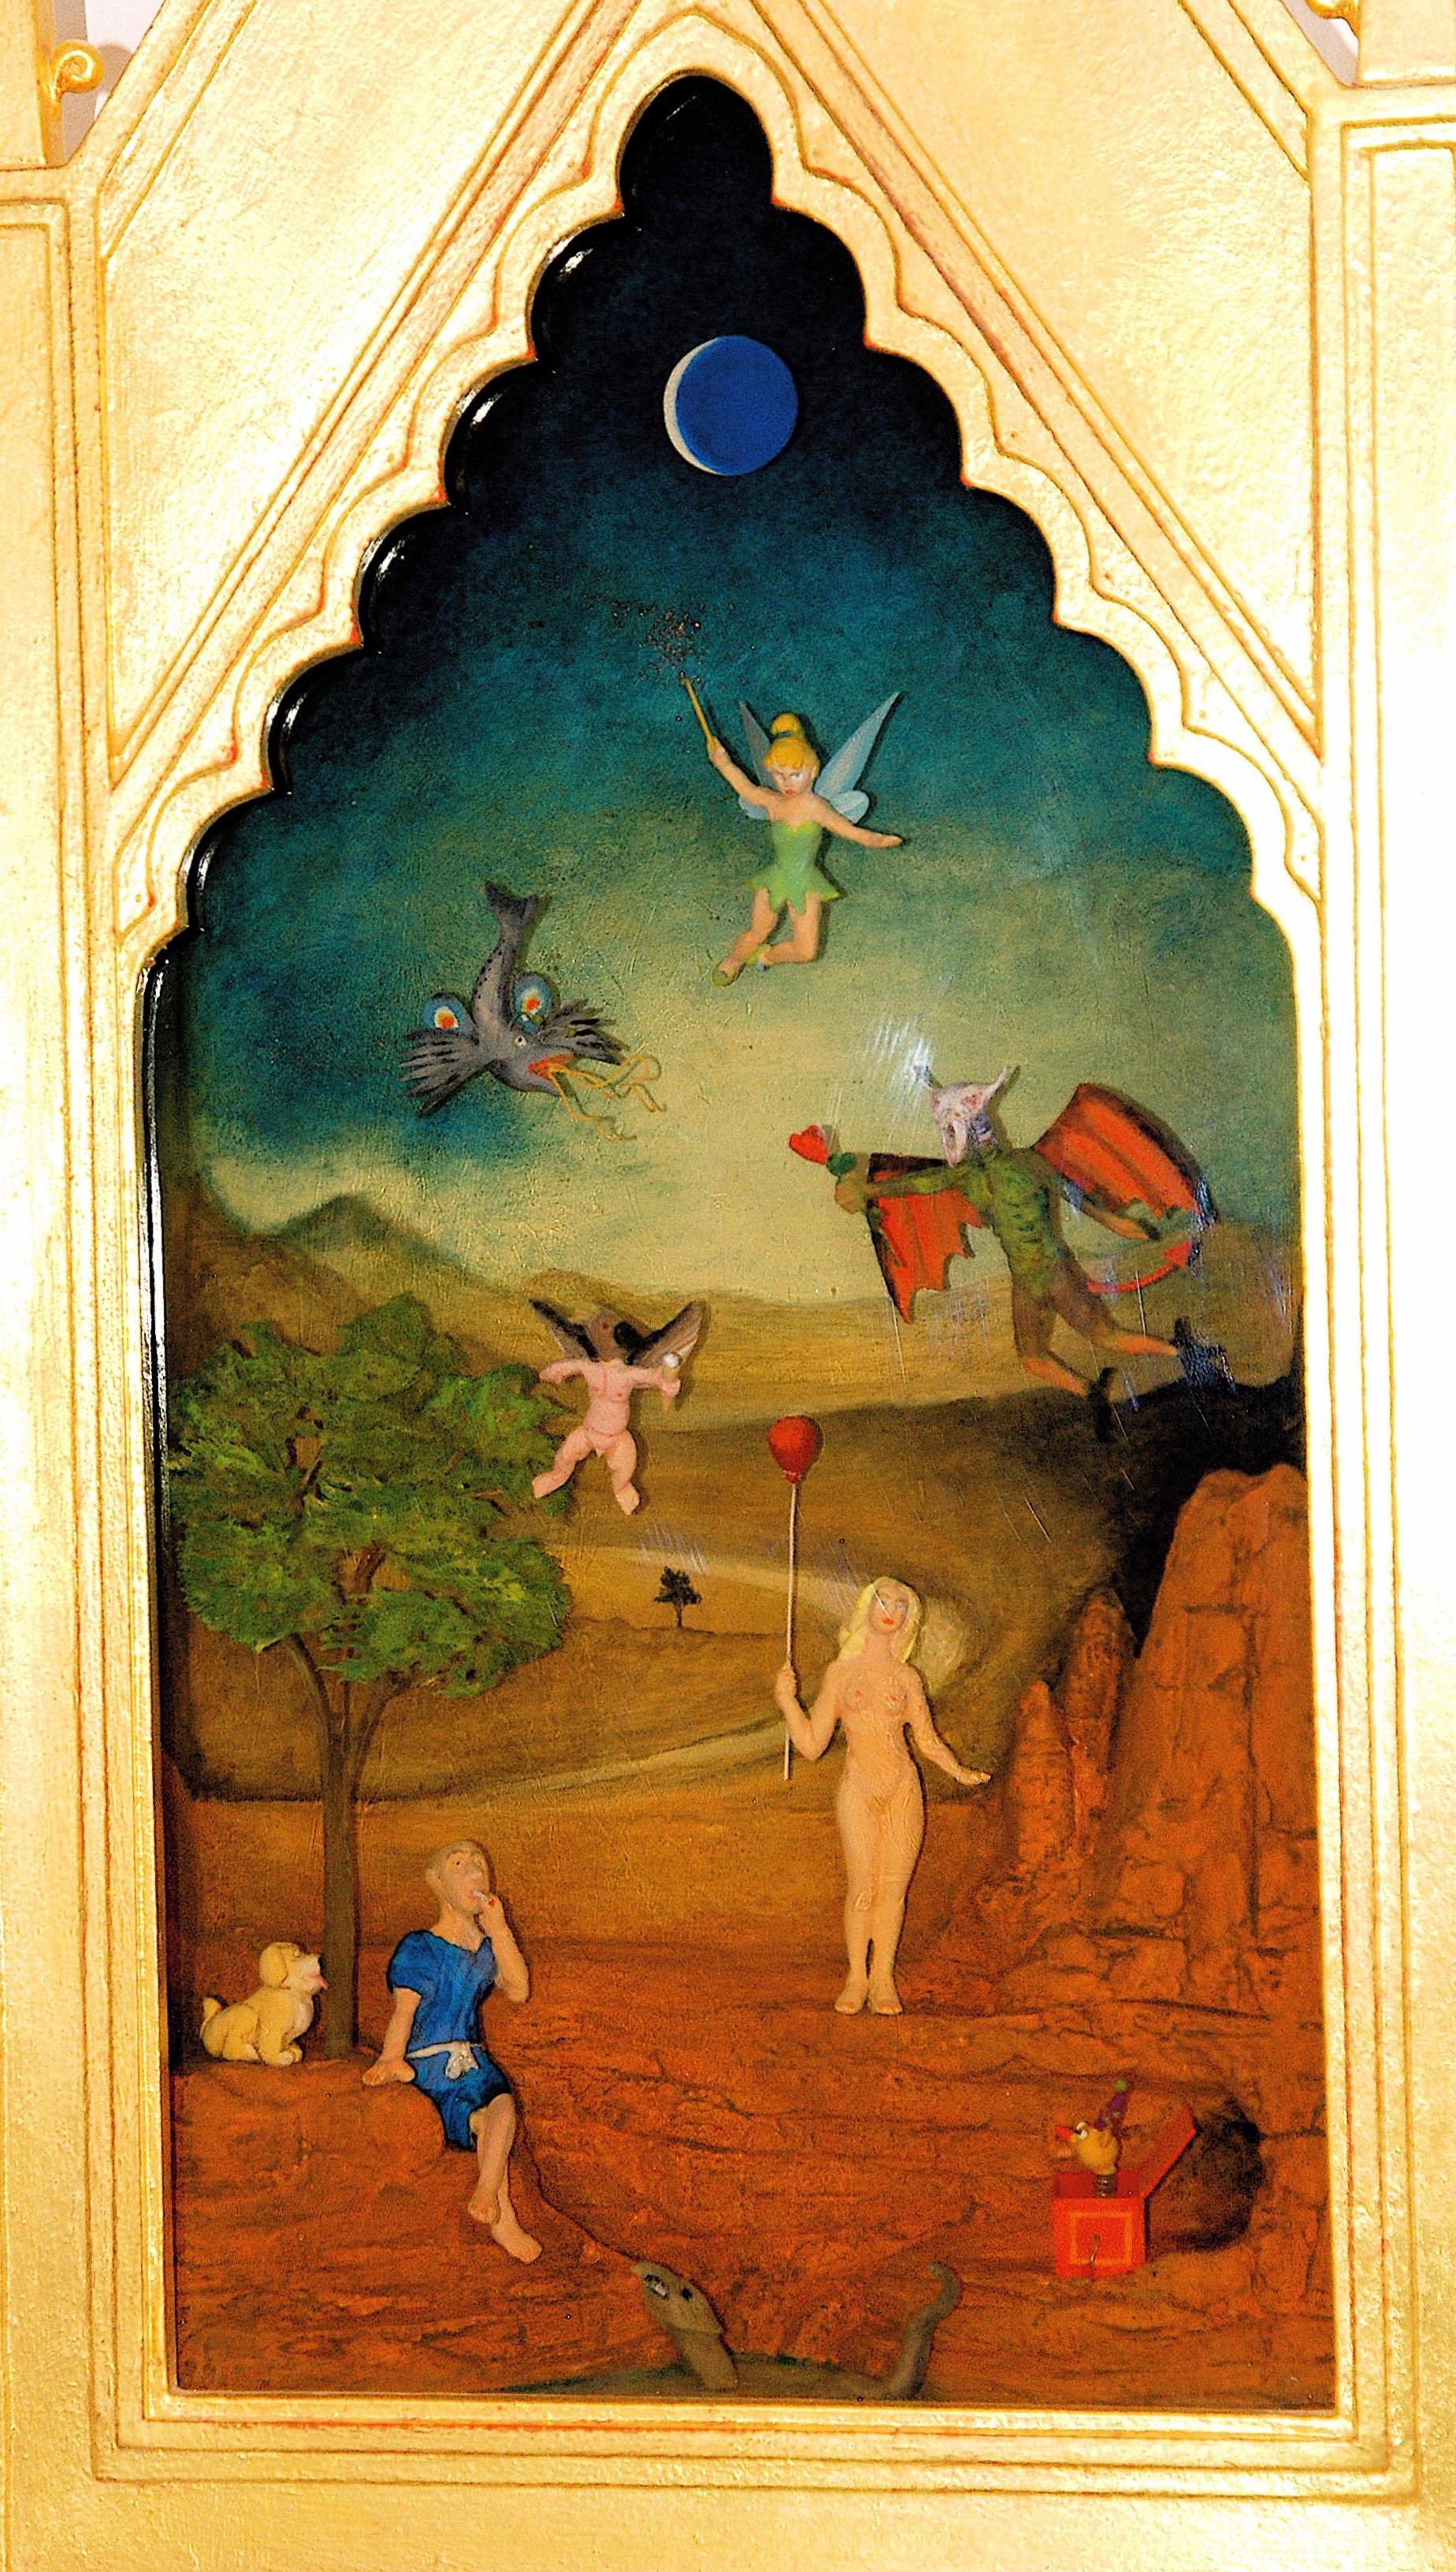 Thomas Coffin - The Temptation of Saint Anthony (detail)